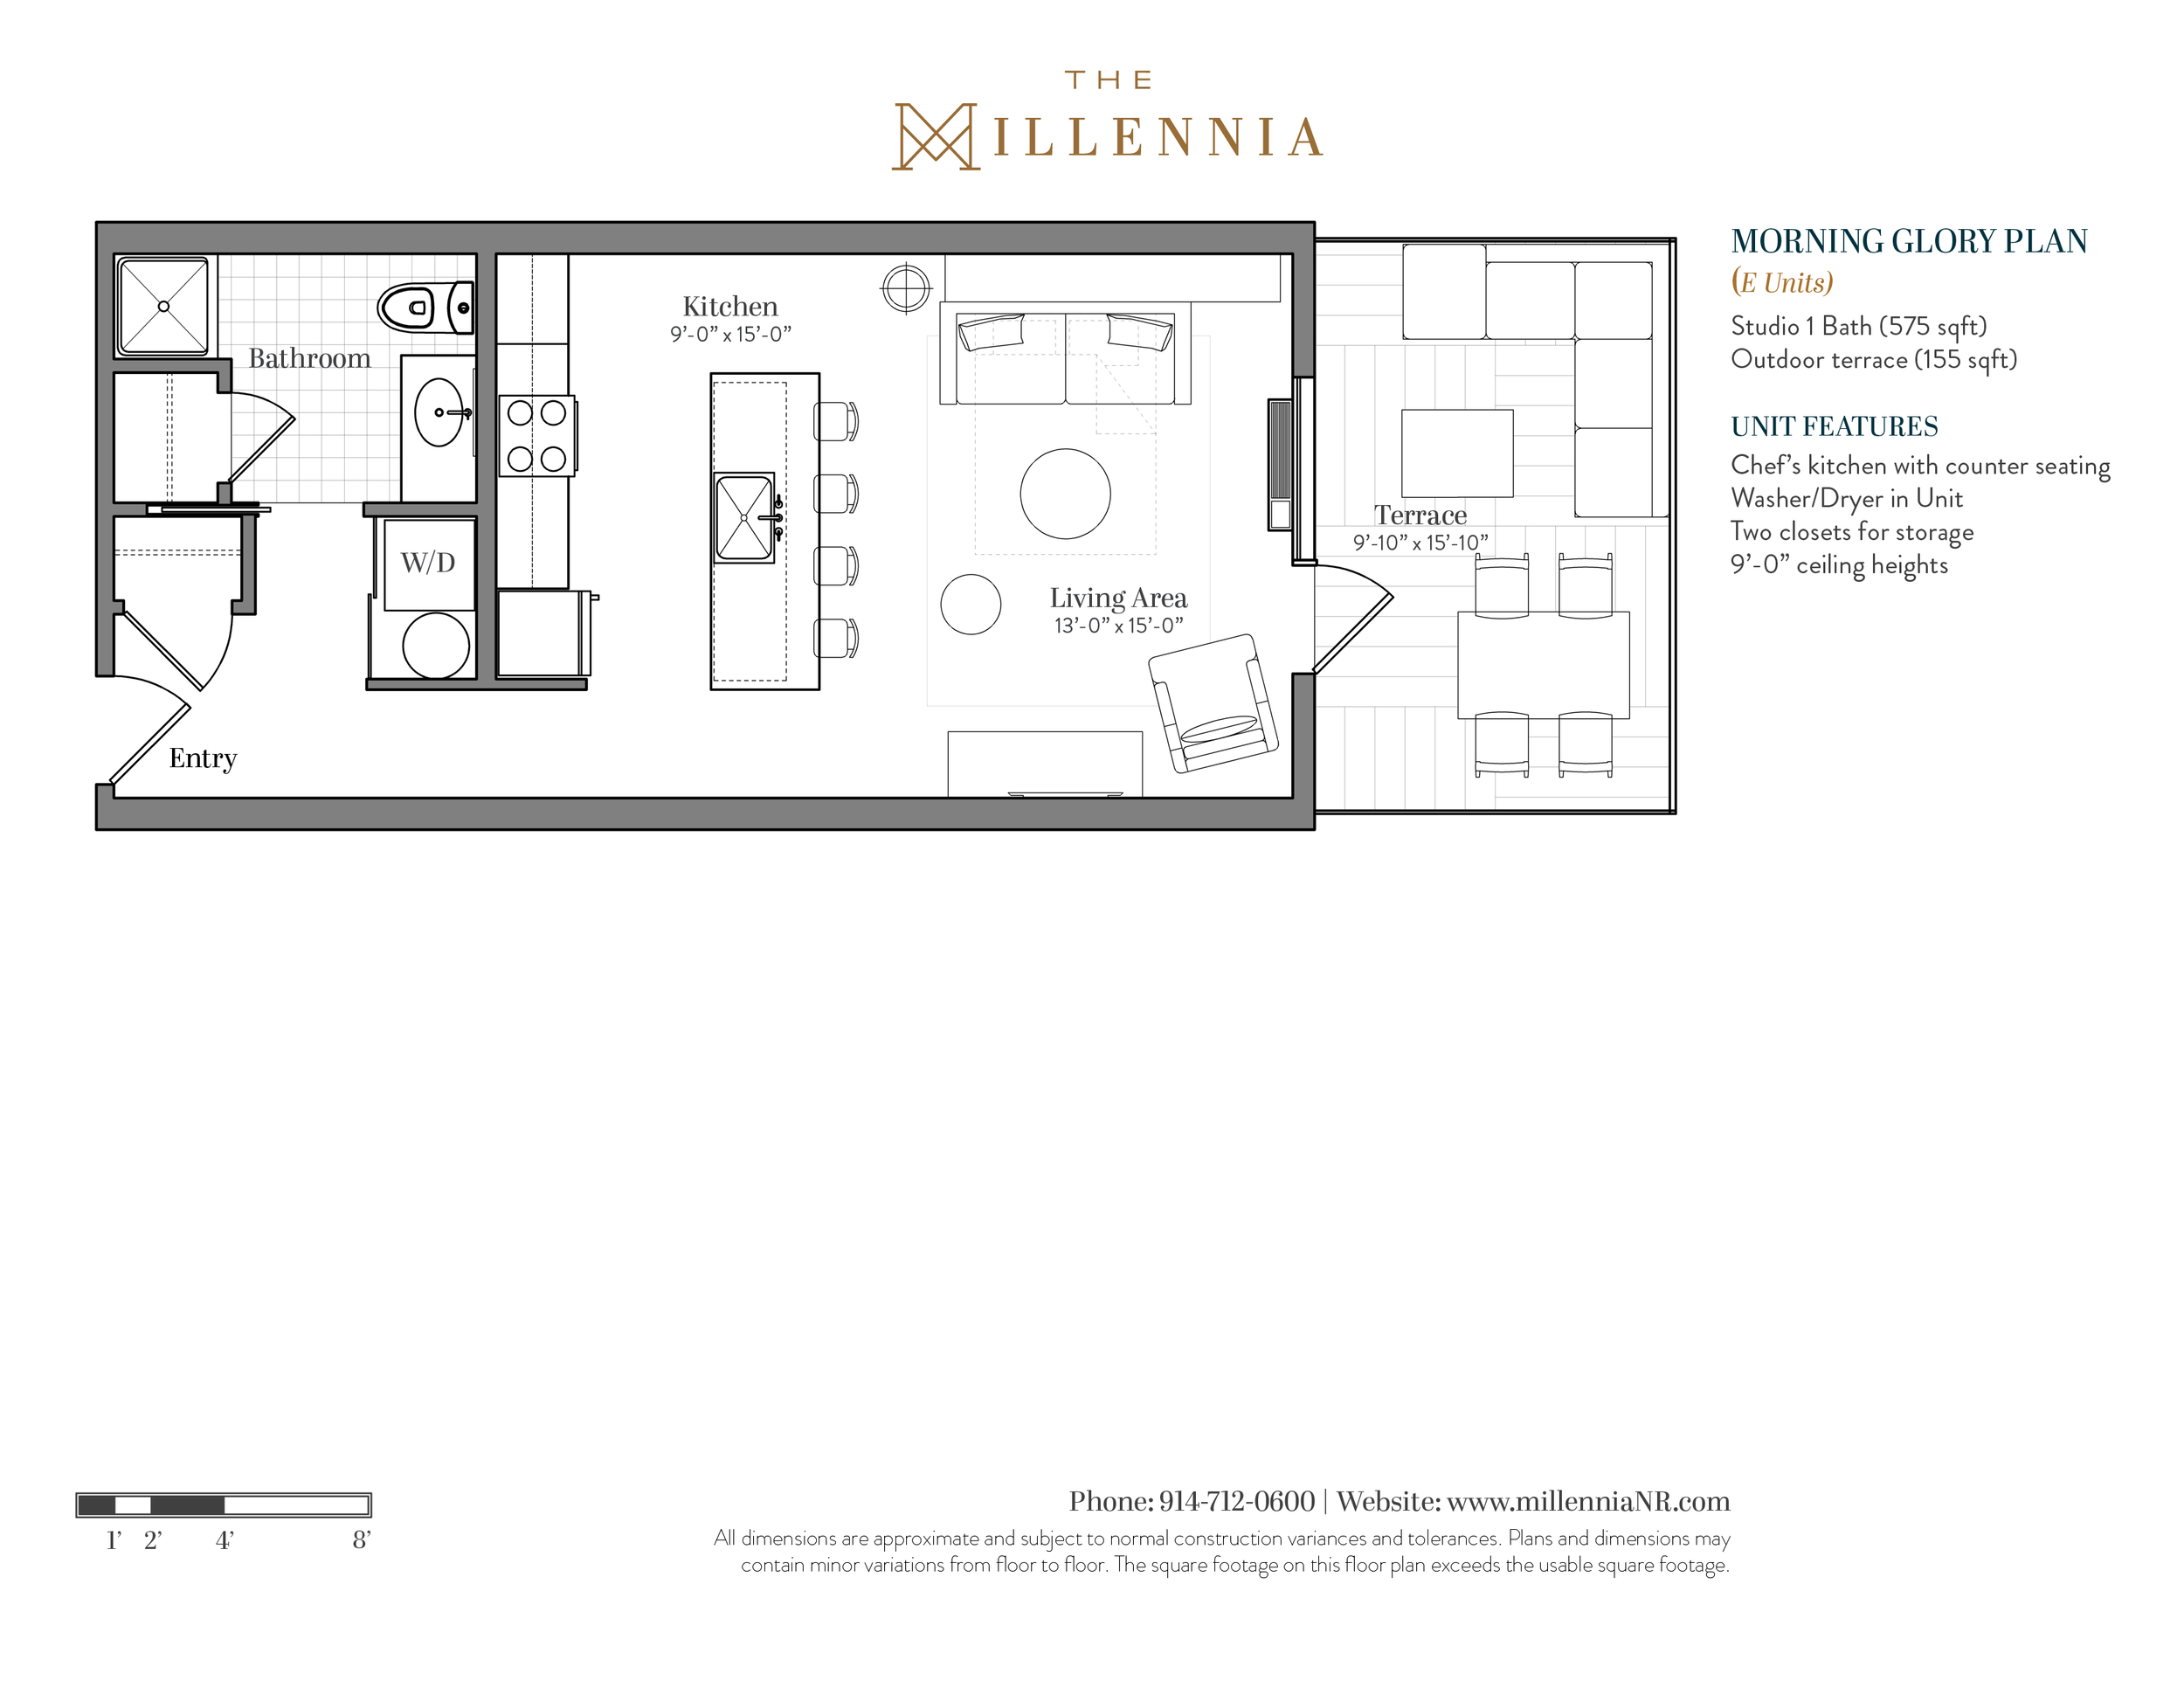 Millennia_Floorplans_Morning_Glory.png